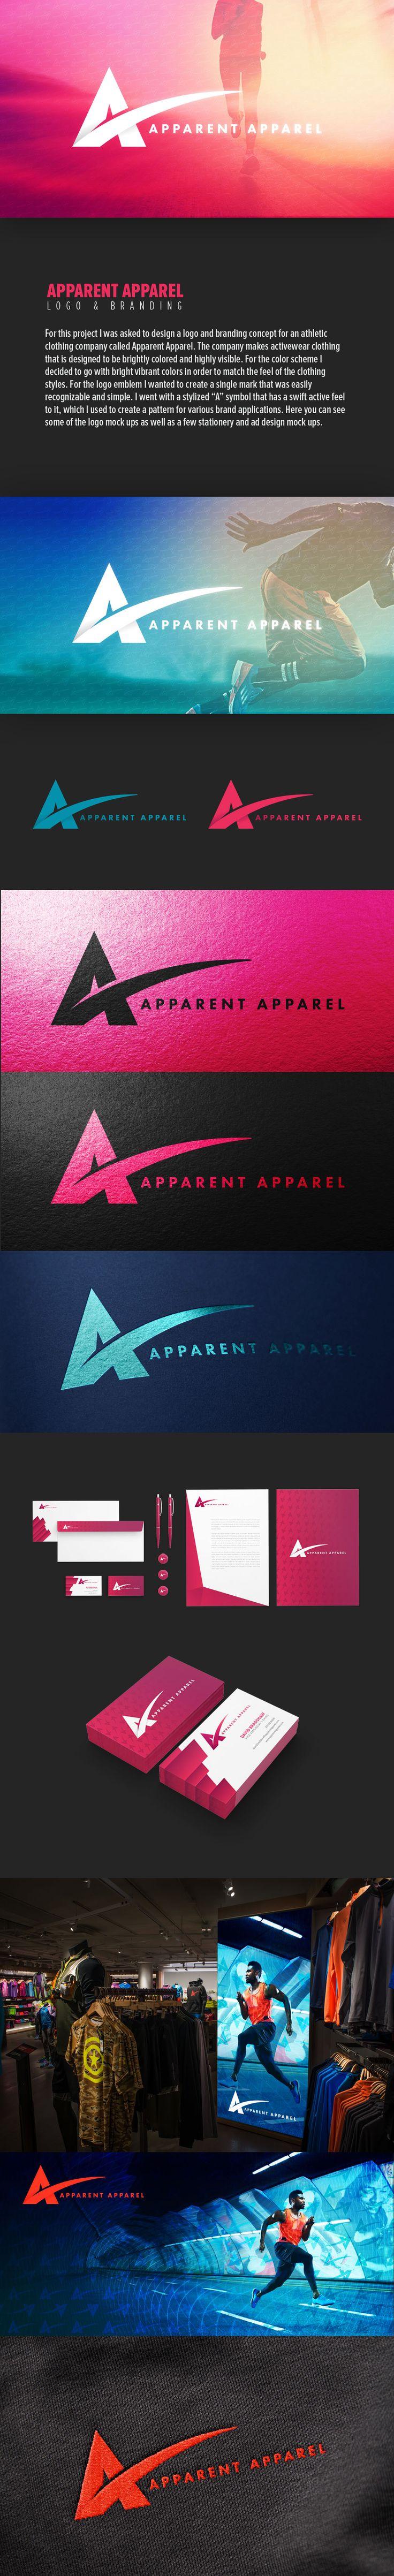 Apparent Apparel Logo & Branding on Behance